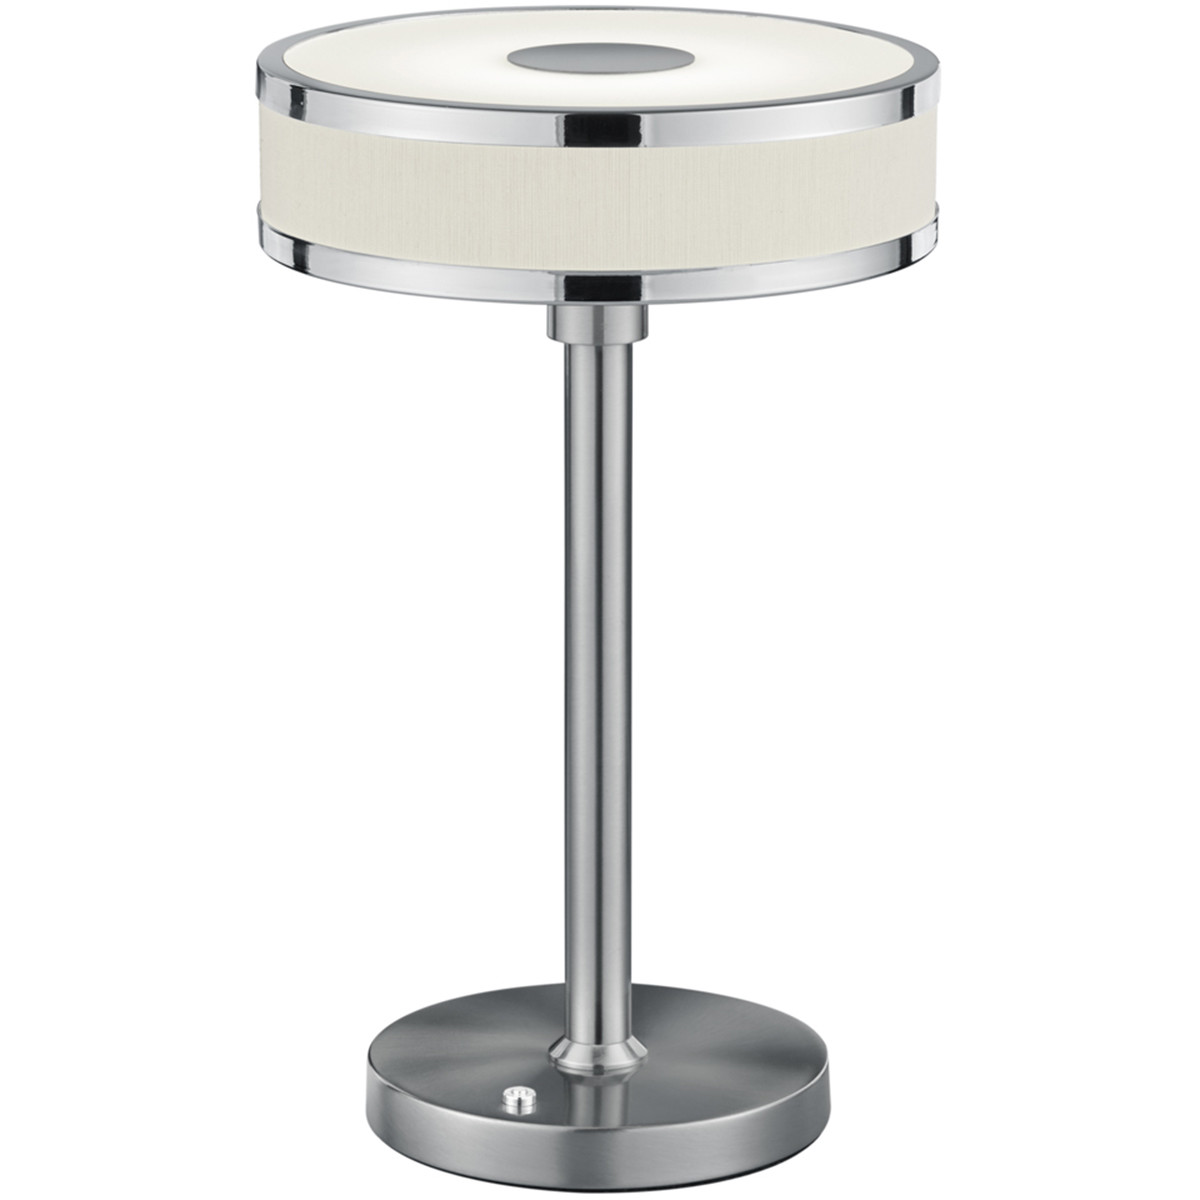 LED Tafellamp - Trion Agiany - 7W - Warm Wit 3000K - Dimbaar - Rond - Mat Nikkel